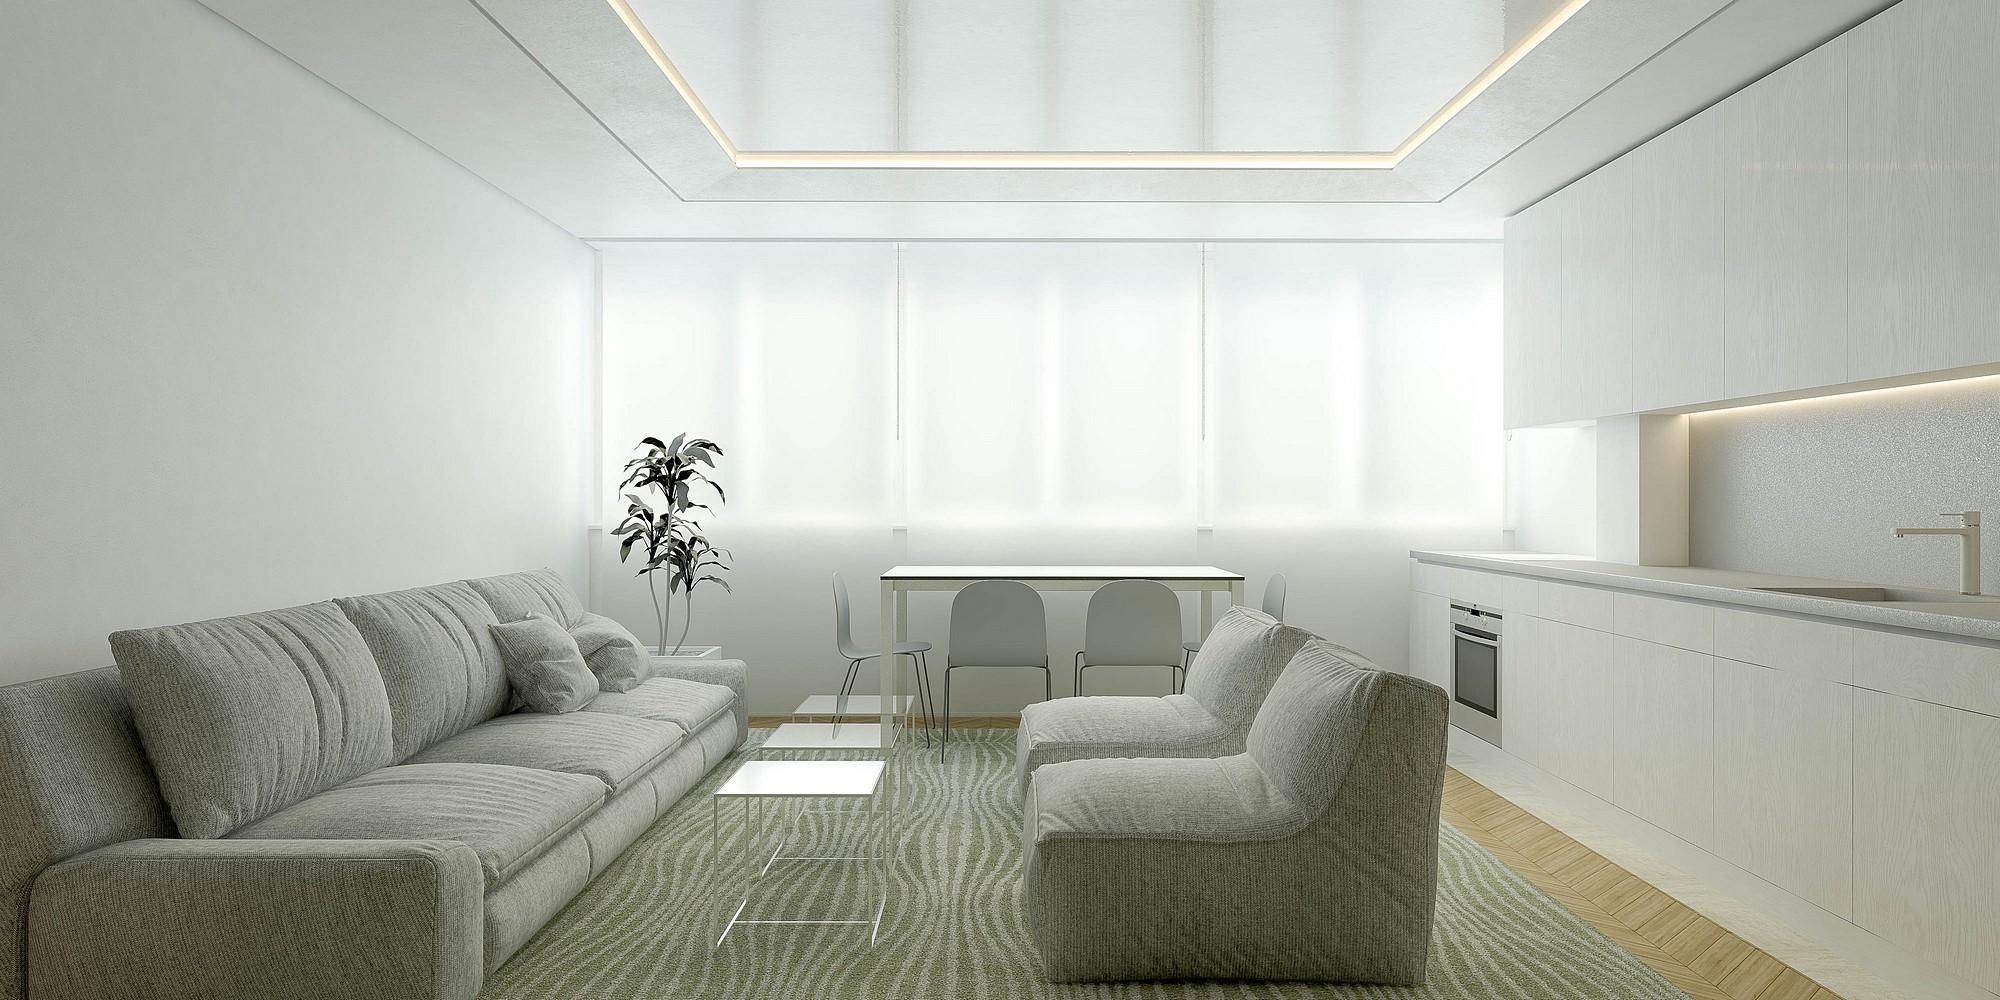 Enterijer-stan-Andreu-Beograd-Studio-Alfirevic-arhitektura-arhitekta-02